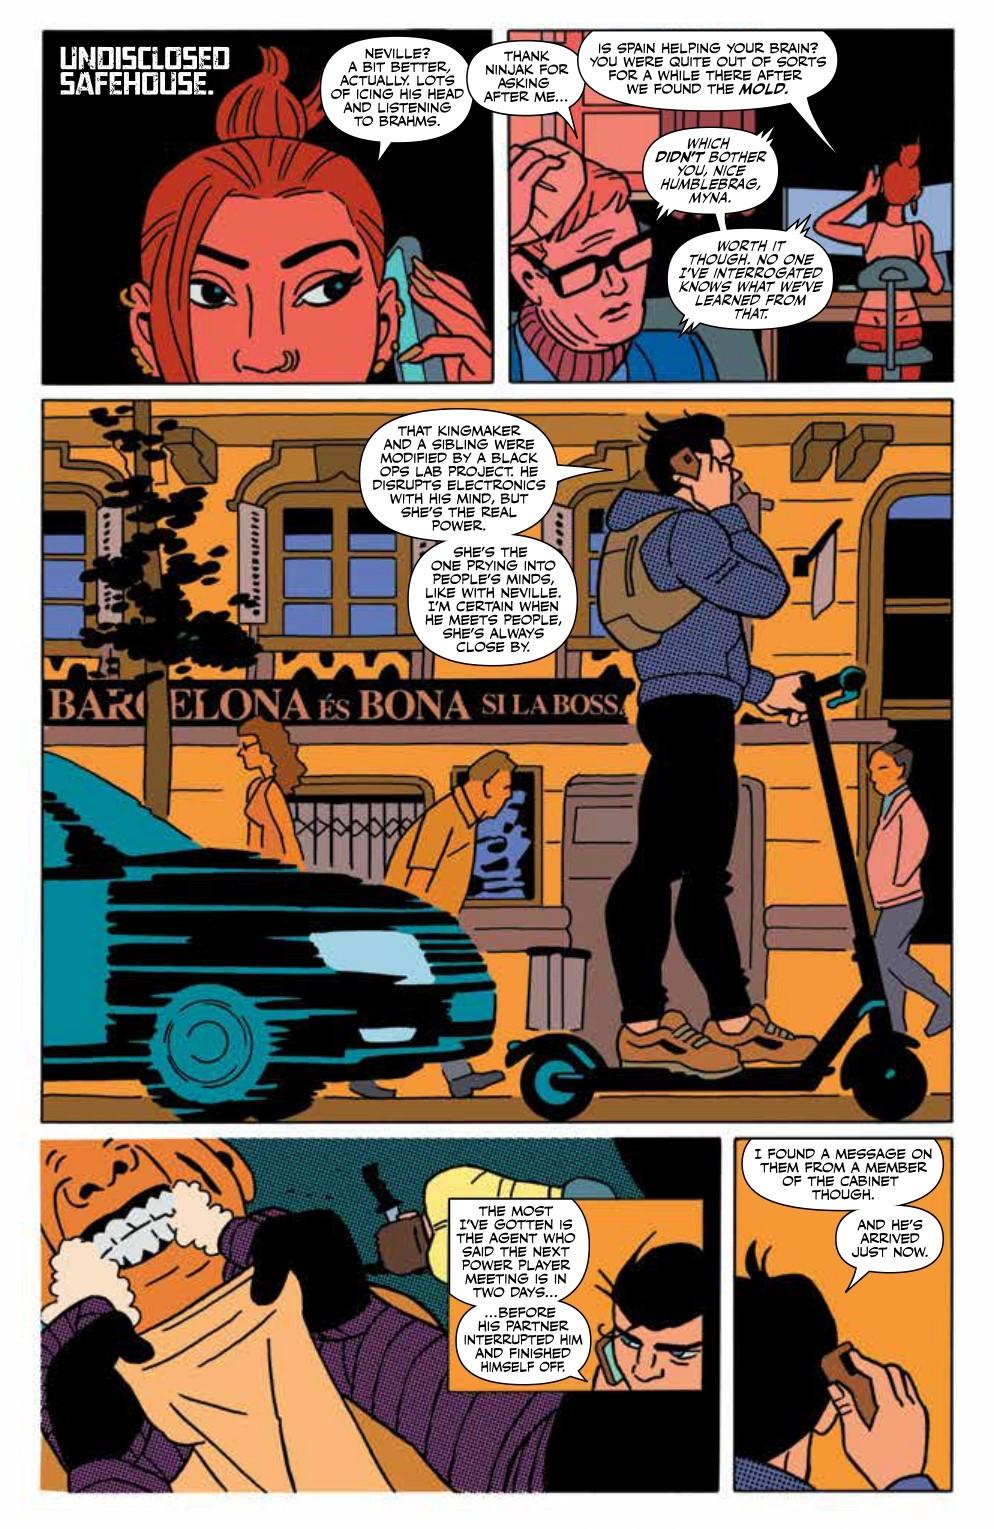 NINJAK_04_PREVIEW_3 ComicList Previews: NINJAK #4